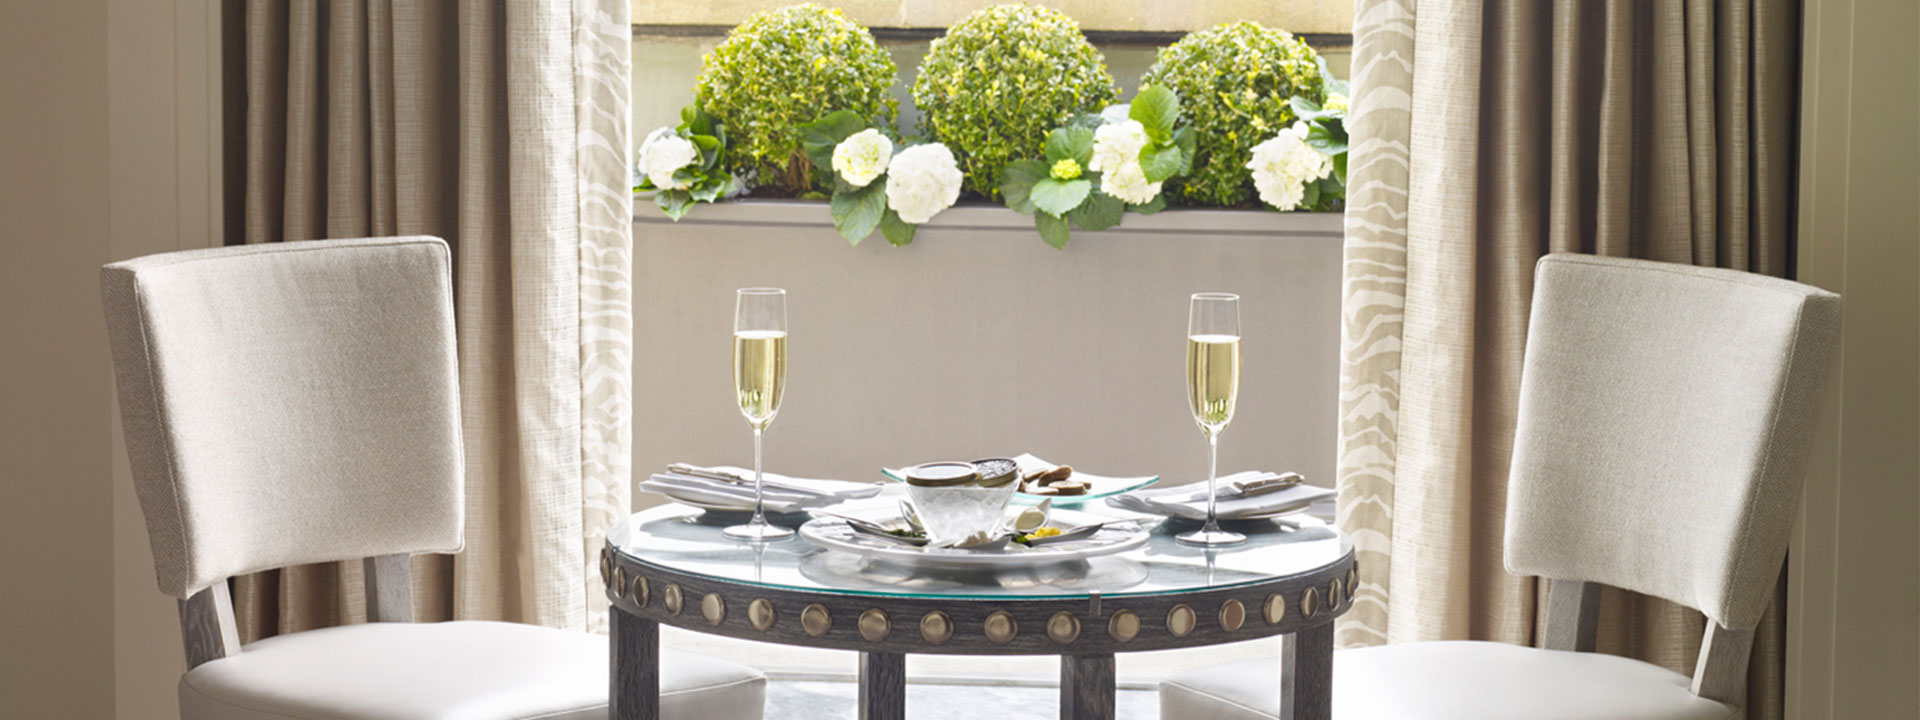 Balcony Junior Suite Dining Area